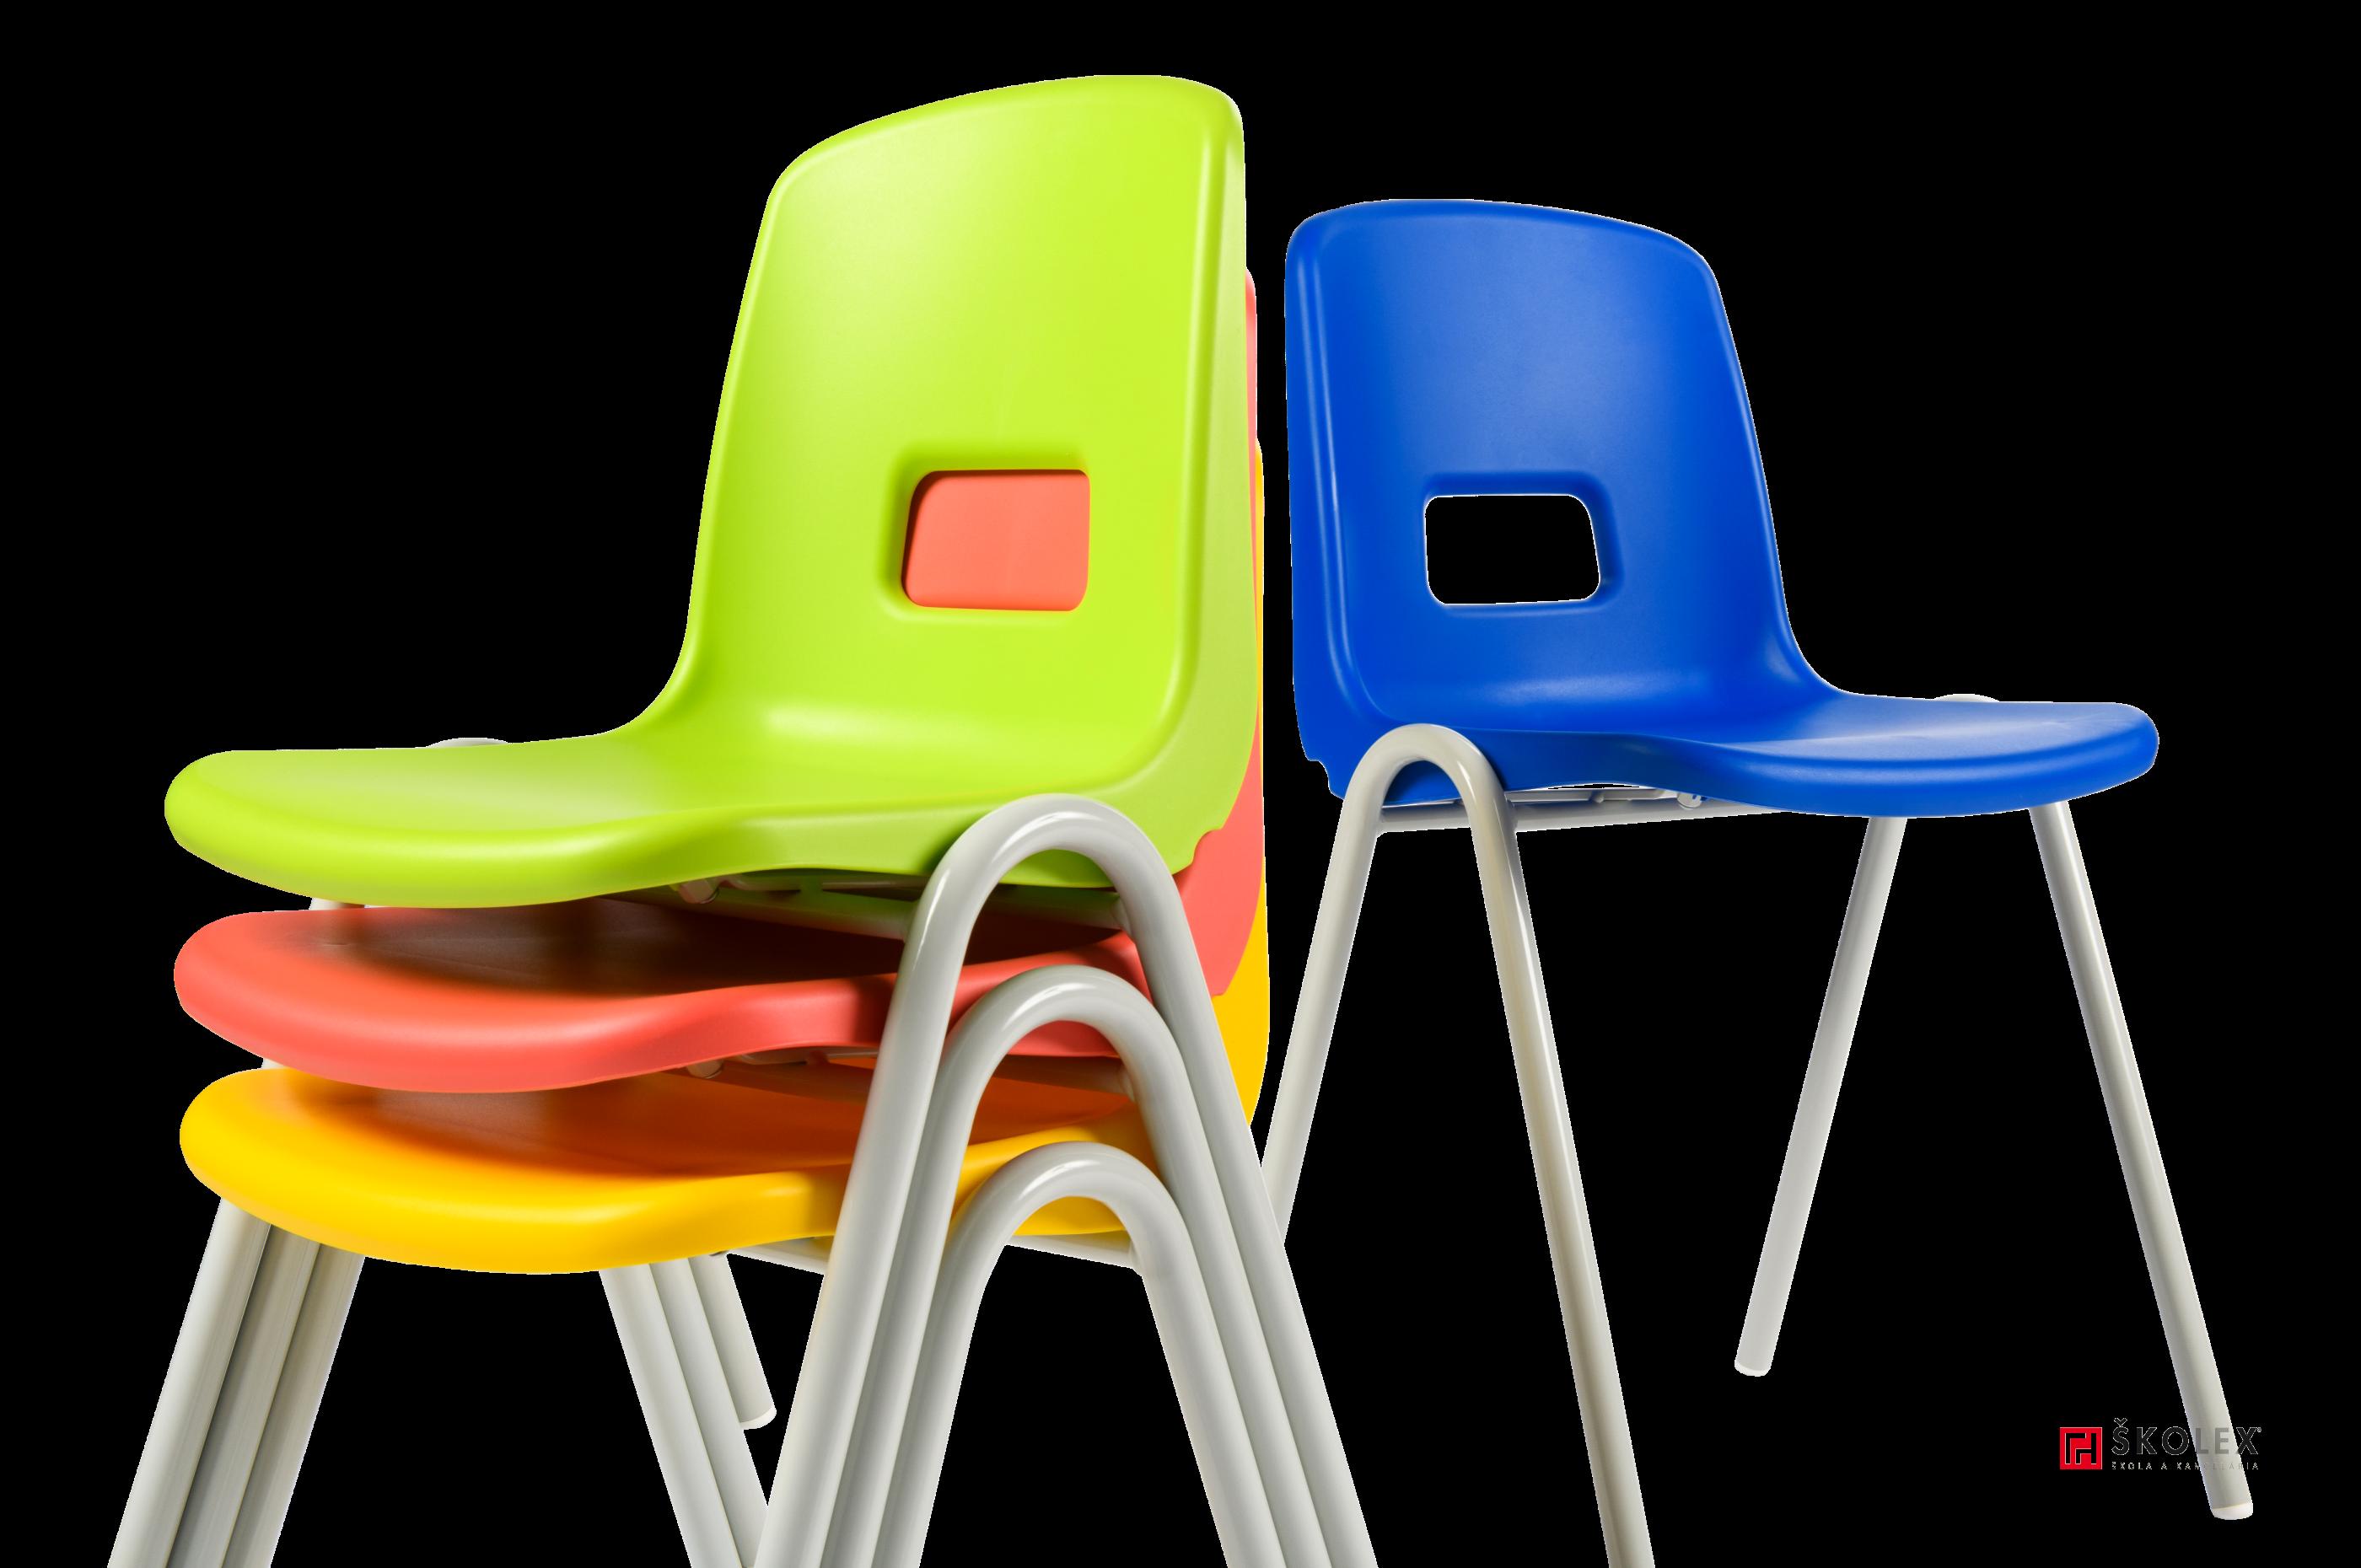 Stuhl TINA mit Kunststoffsessel / Skolex